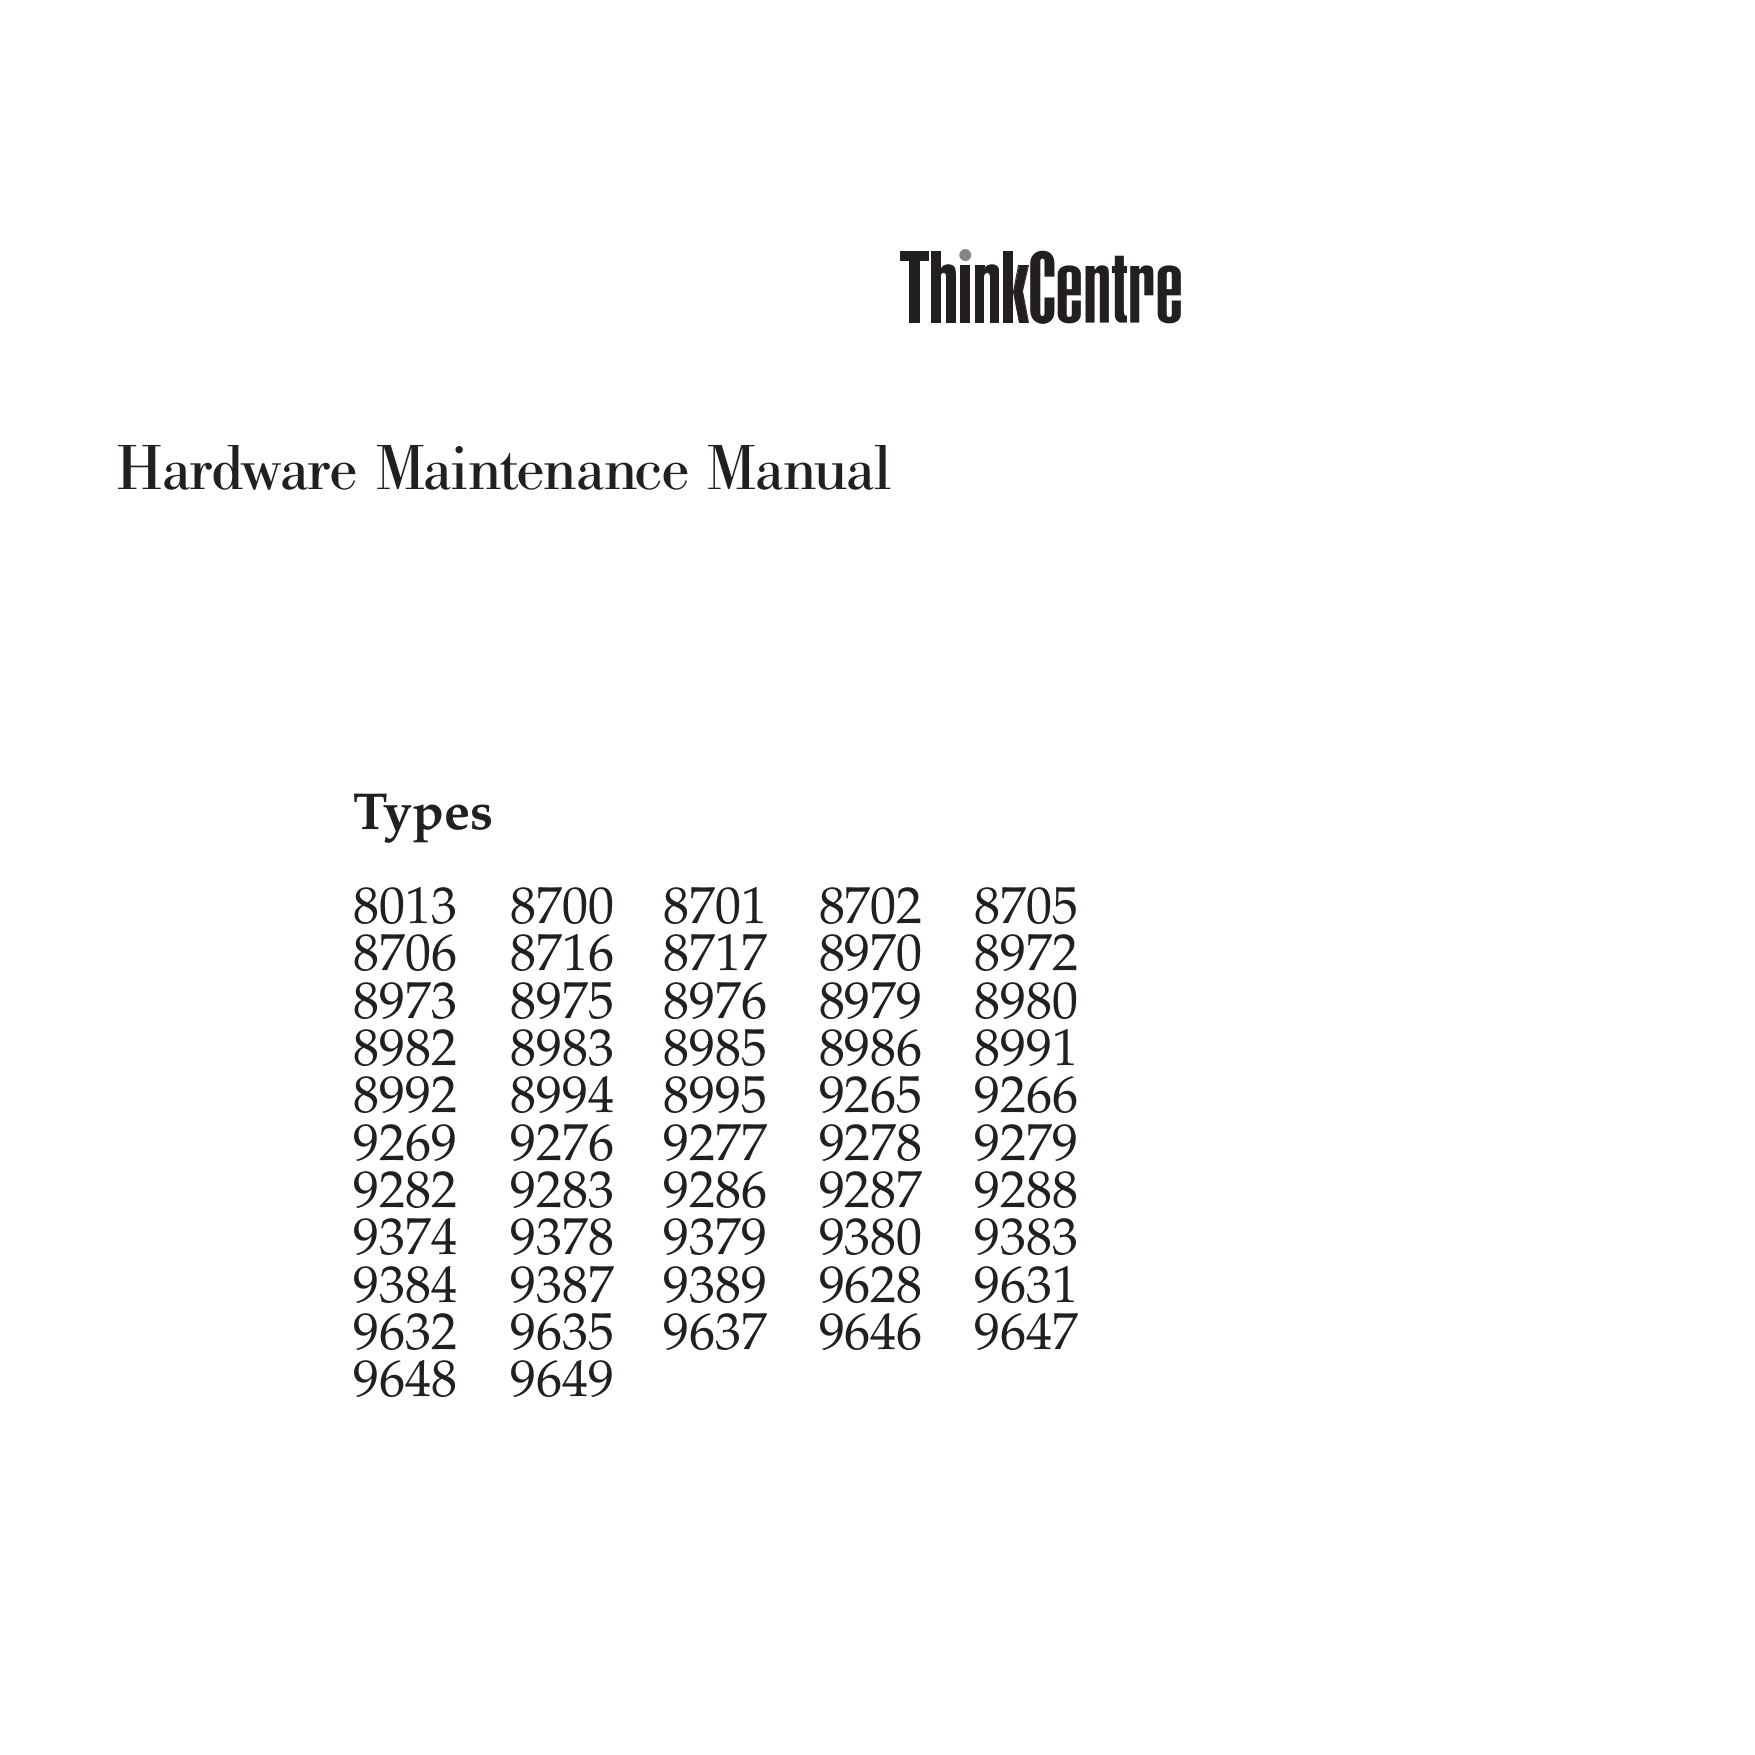 pdf for Lenovo Desktop ThinkCentre A60 9384 manual